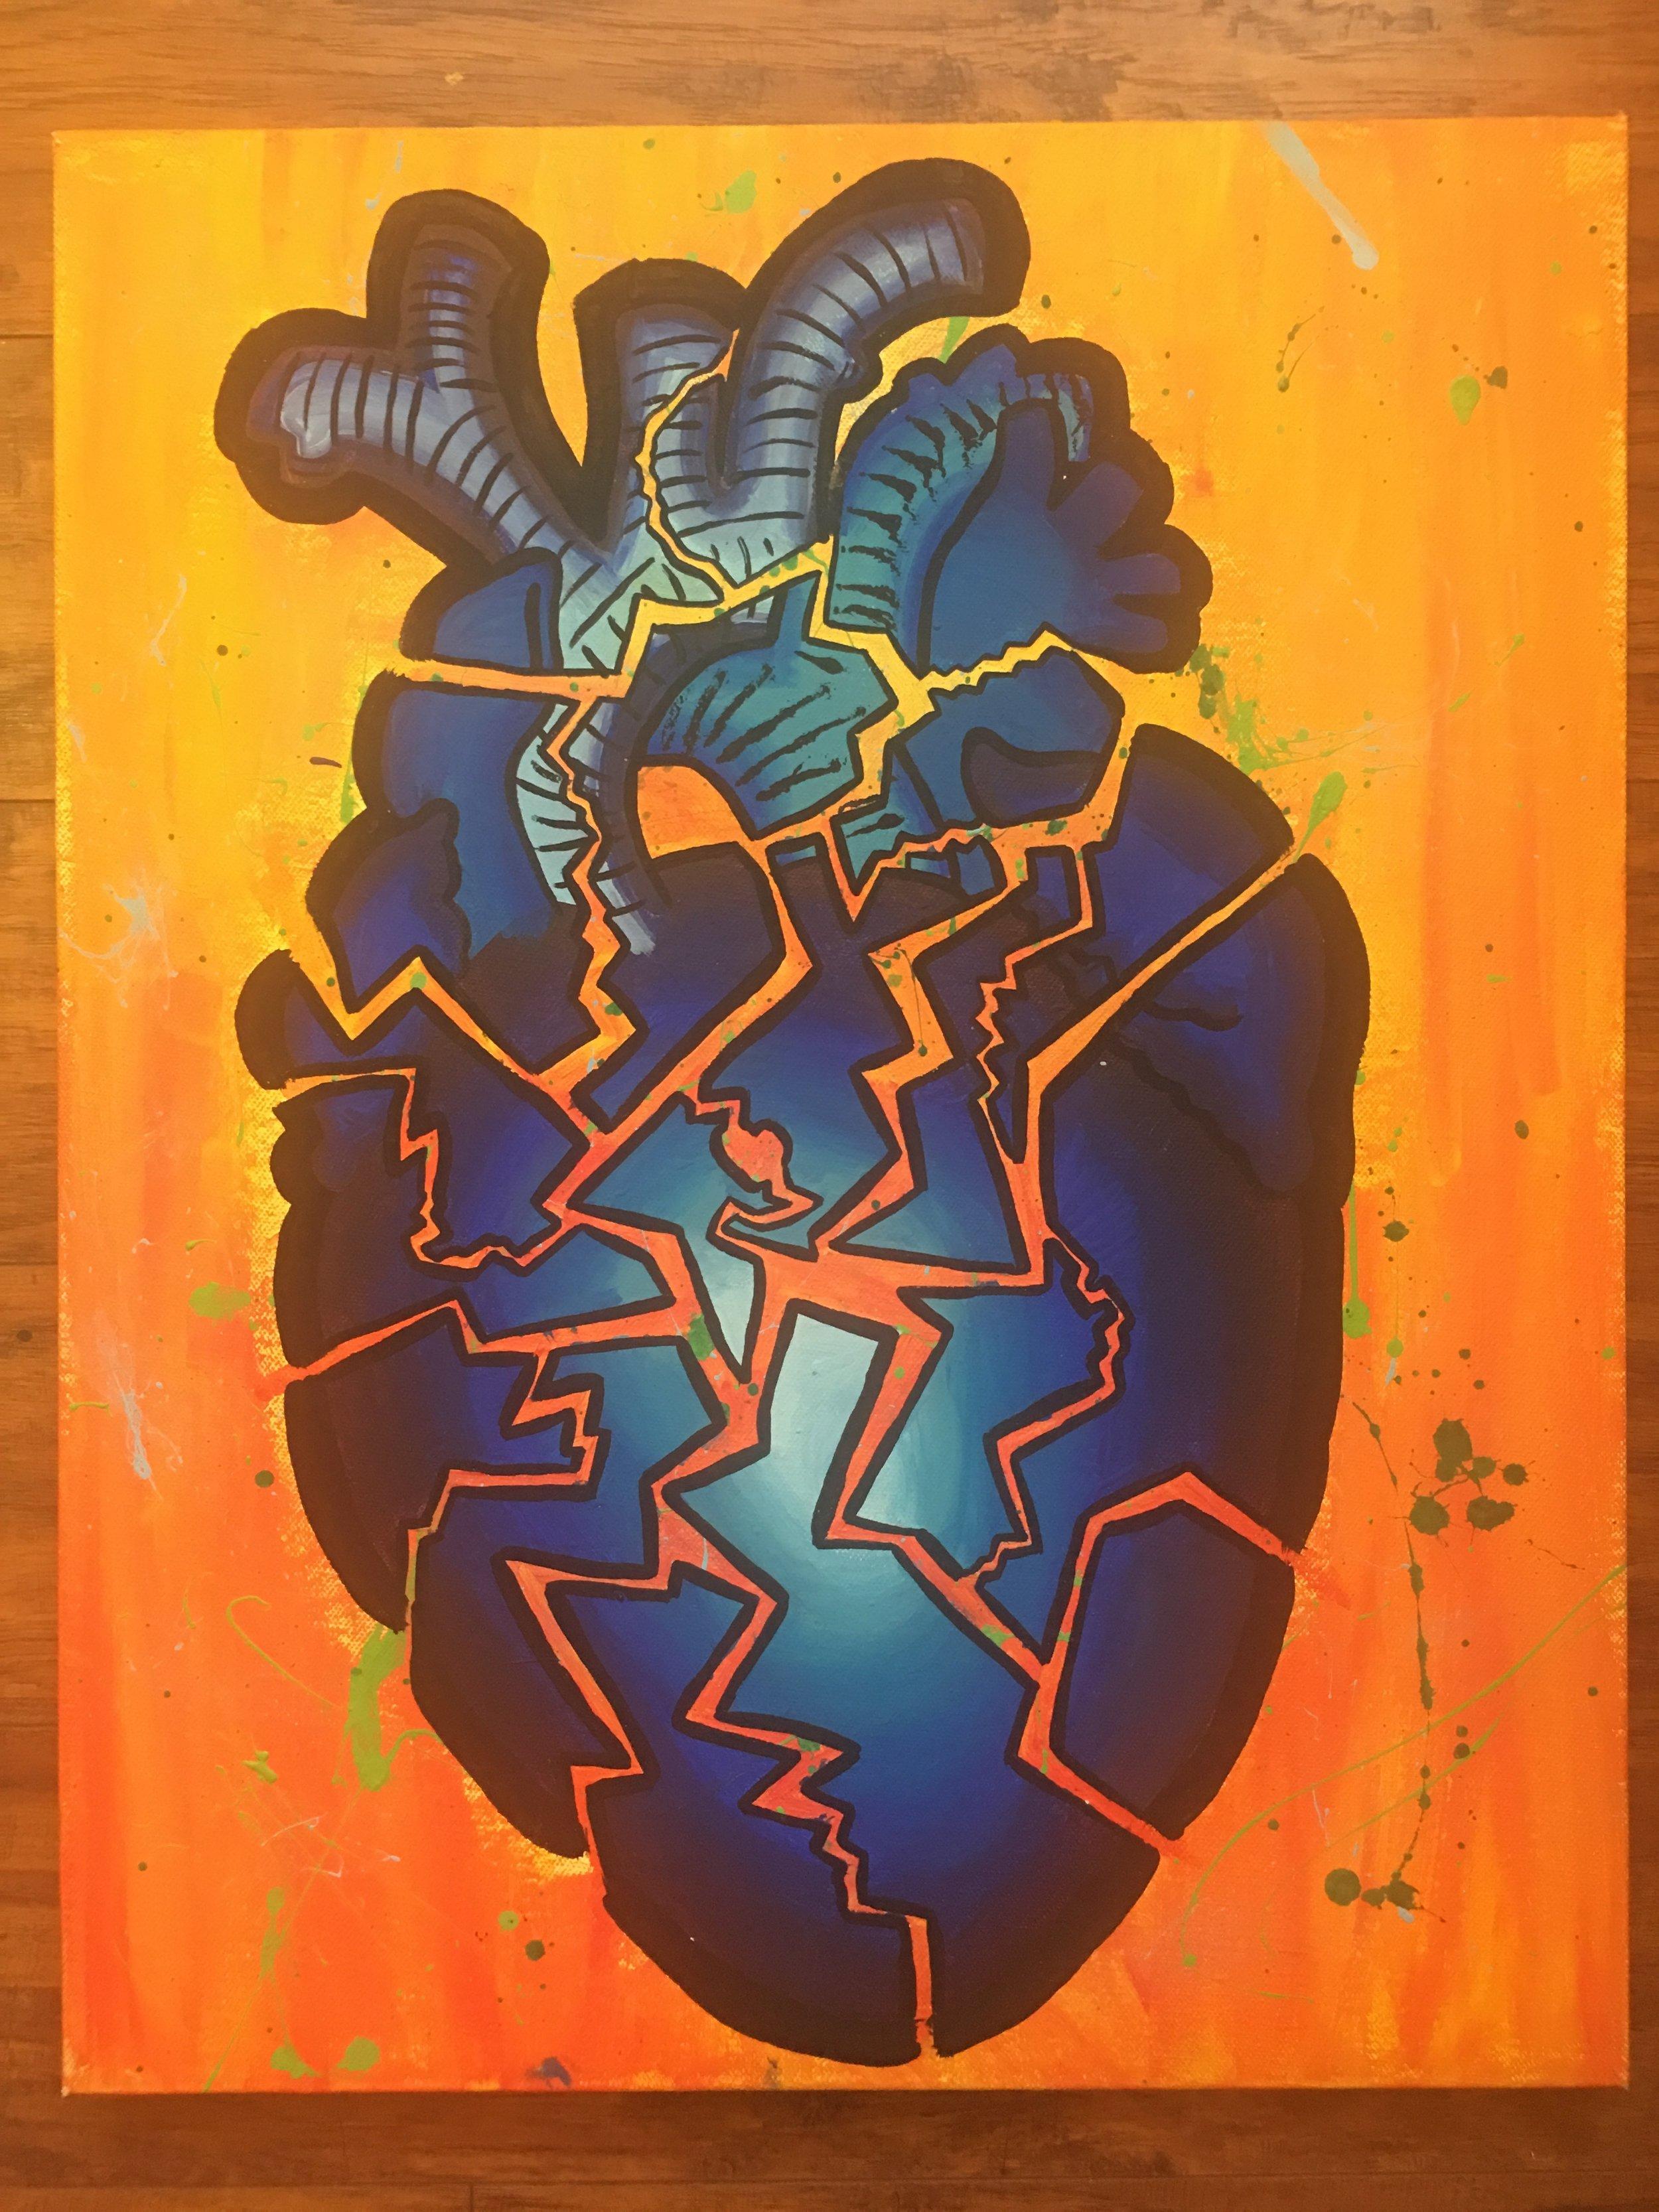 Broken heart2 19